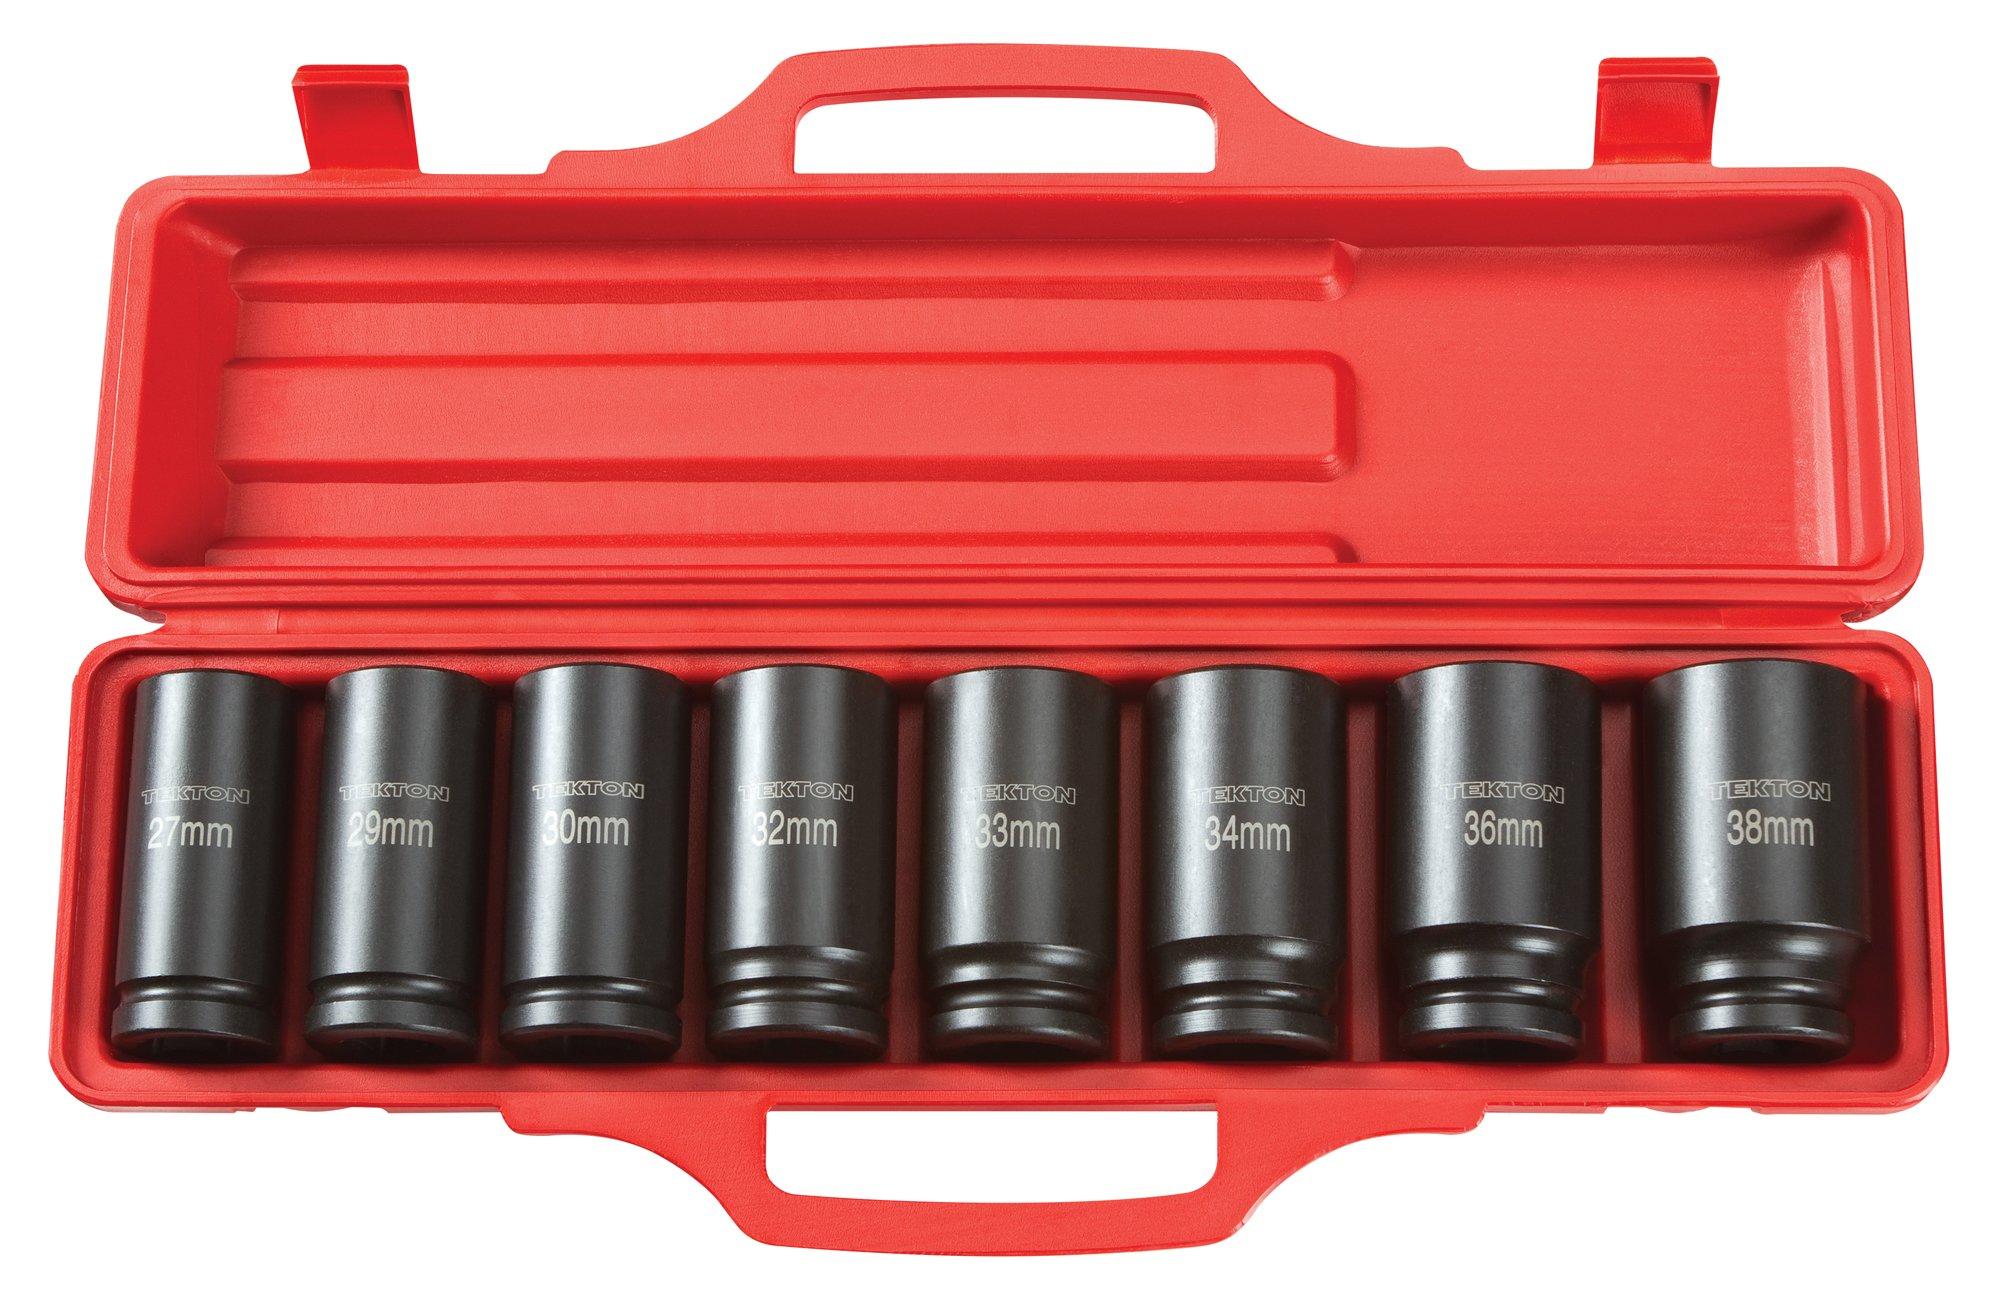 TEKTON 3/4-Inch Drive Deep Impact Socket Set, Metric, Cr-V, 6-Point, 27 mm - 38 mm, 8-Sockets | 4889 by TEKTON